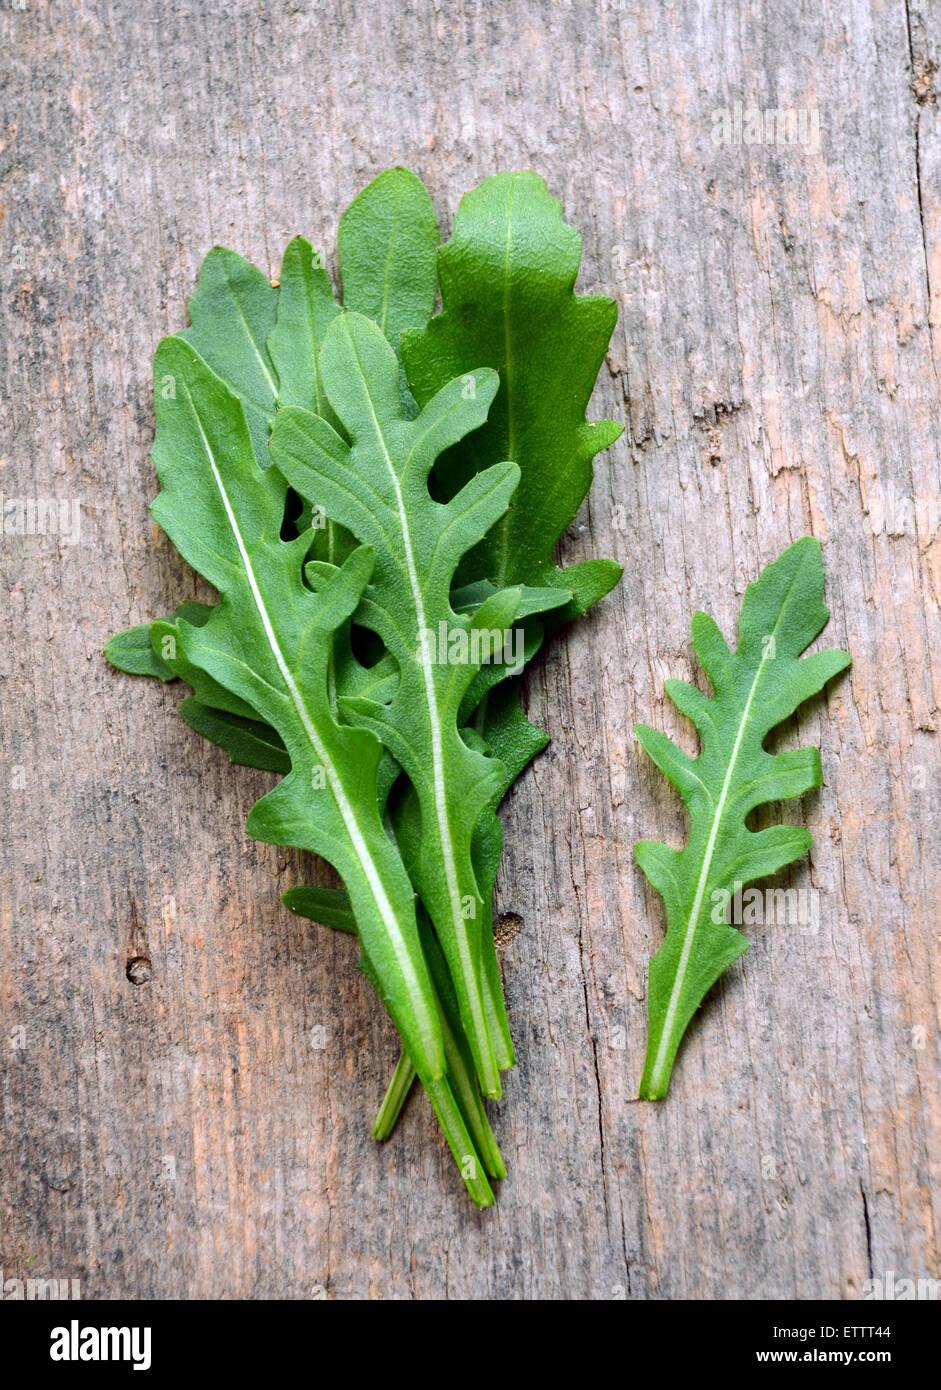 Fresh arugula / salad rocket / roquette / rucola leaves Stock Photo